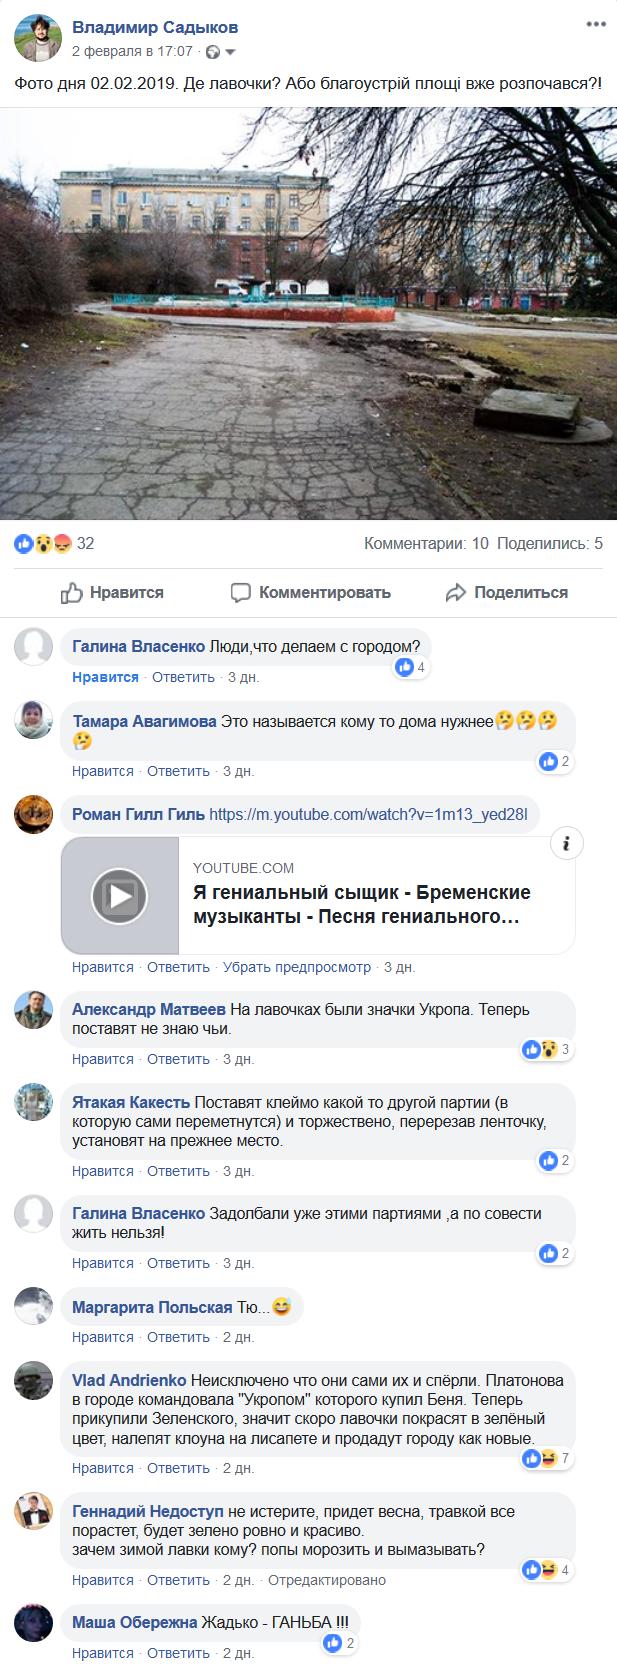 Screenshot_2019-02-05 (4) Владимир Садыков